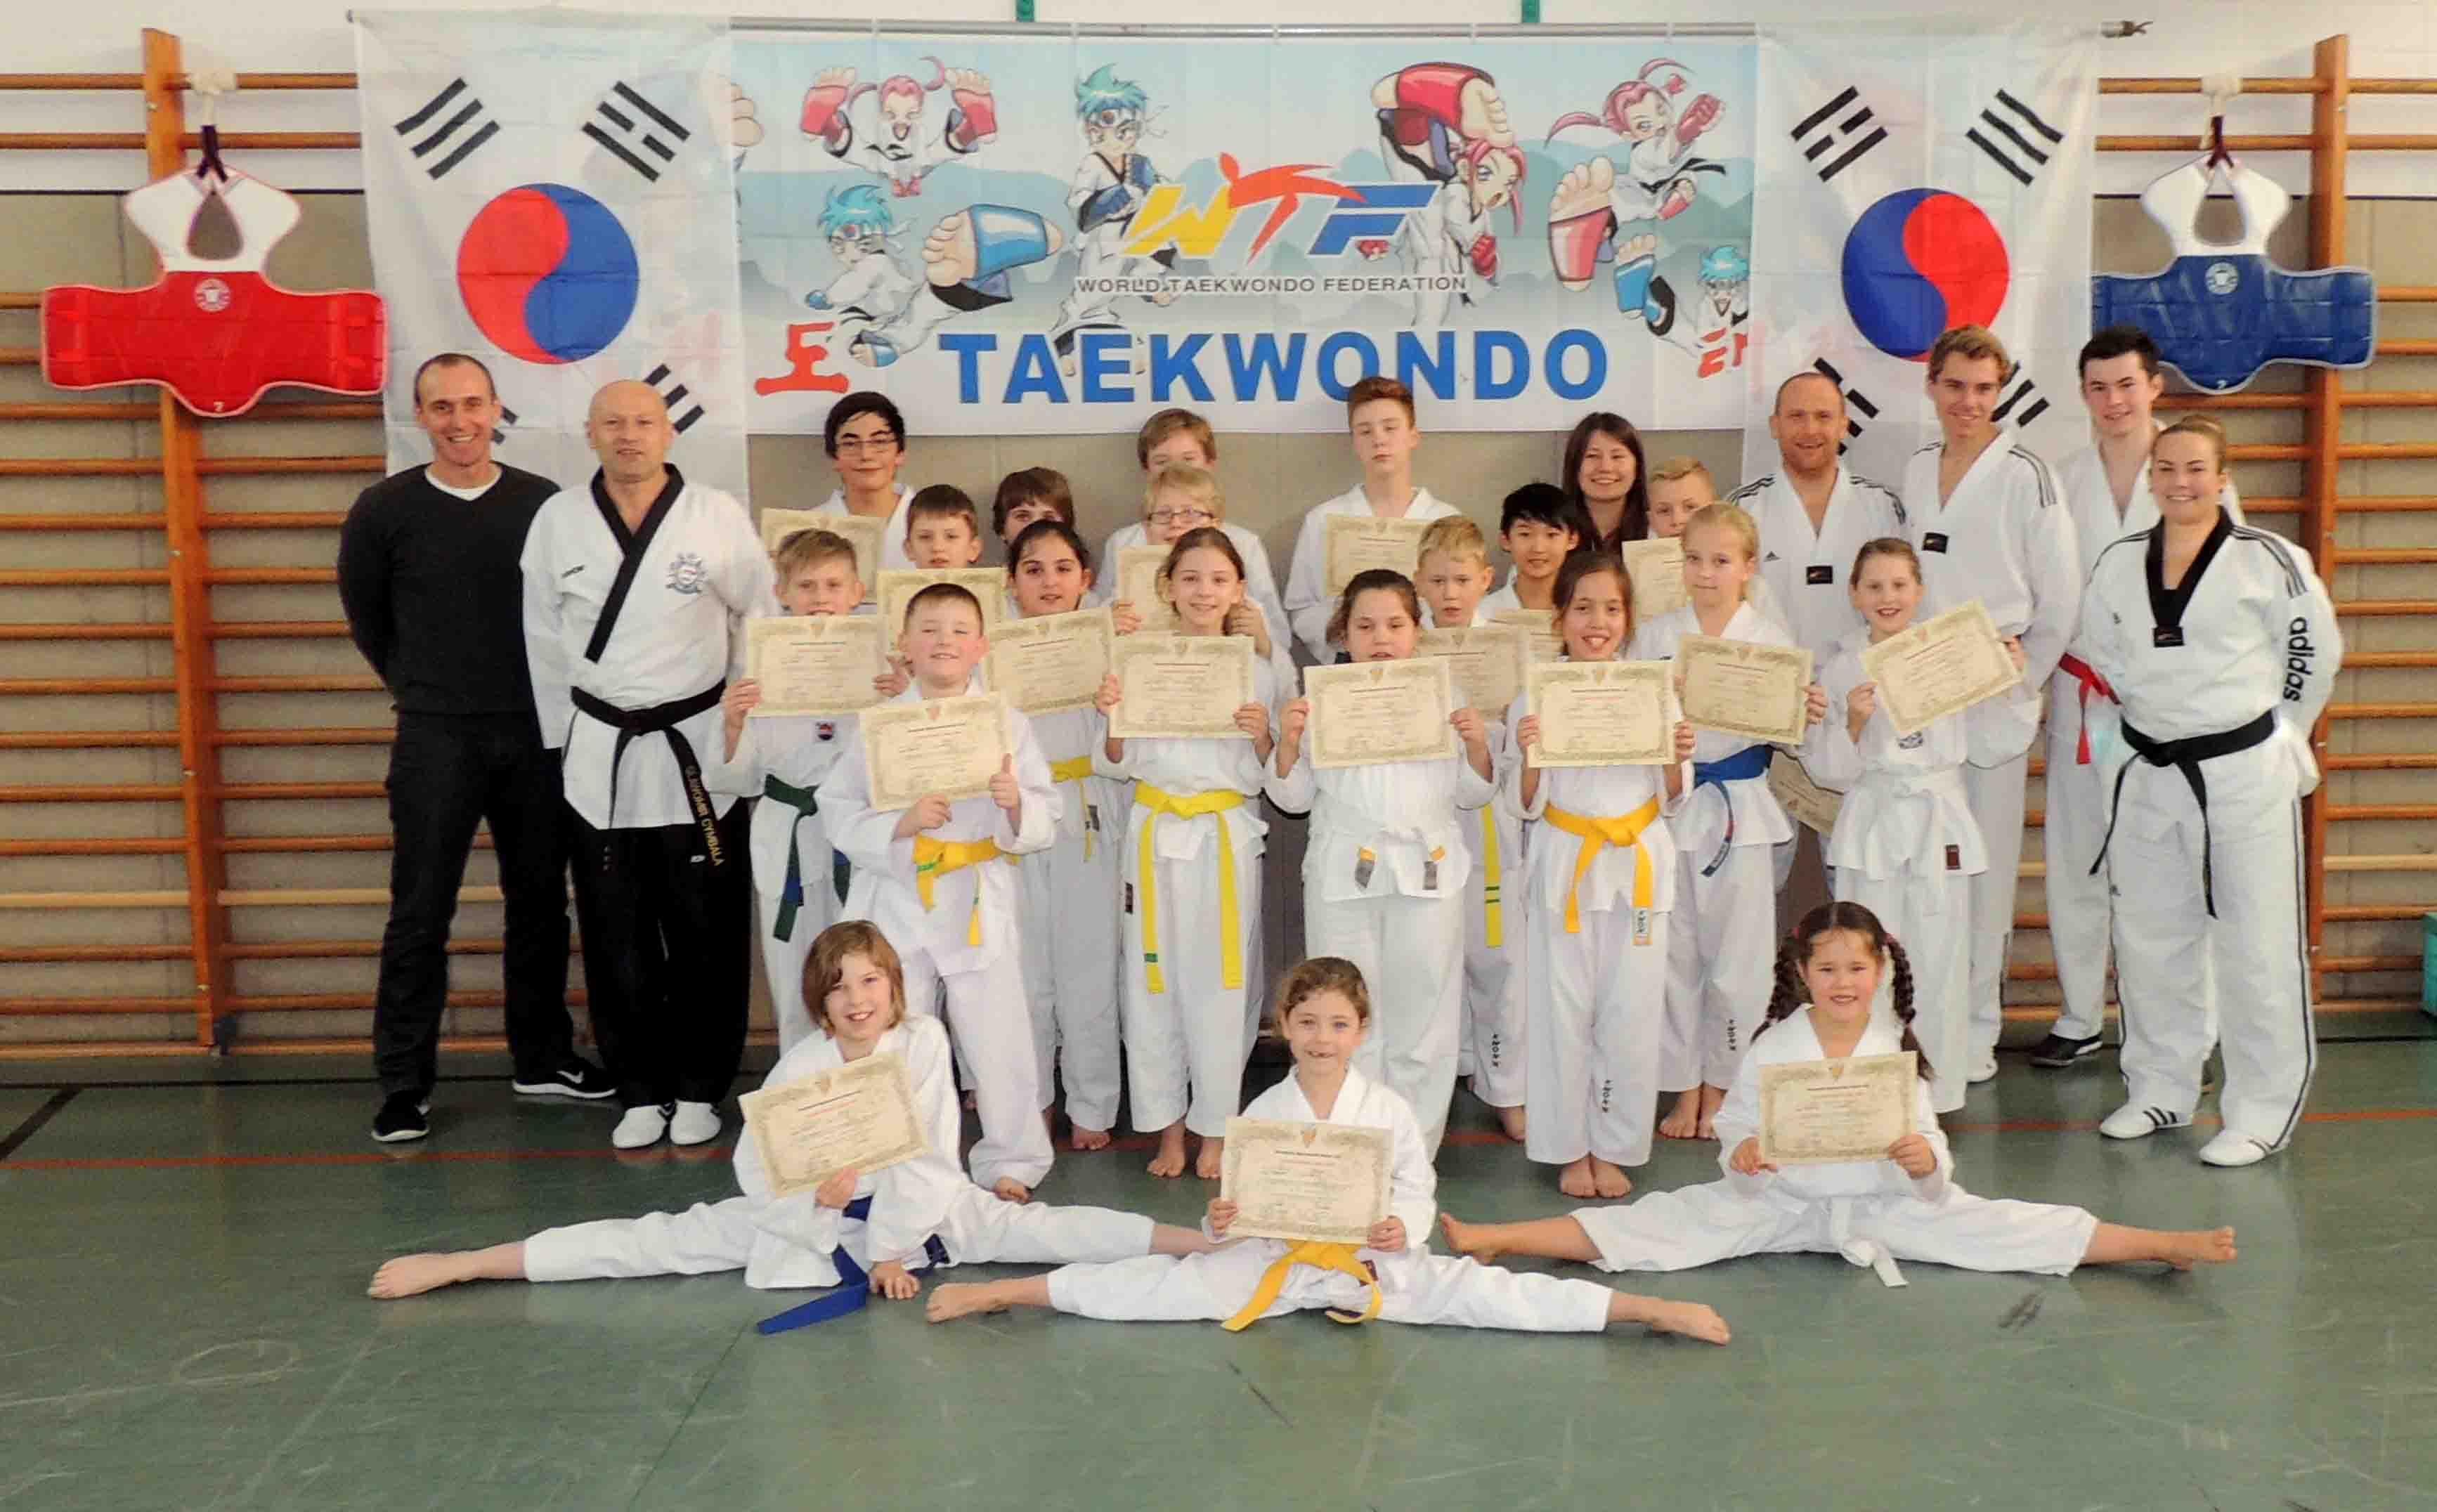 Taekwondo-Kup-Prüfung des JSV